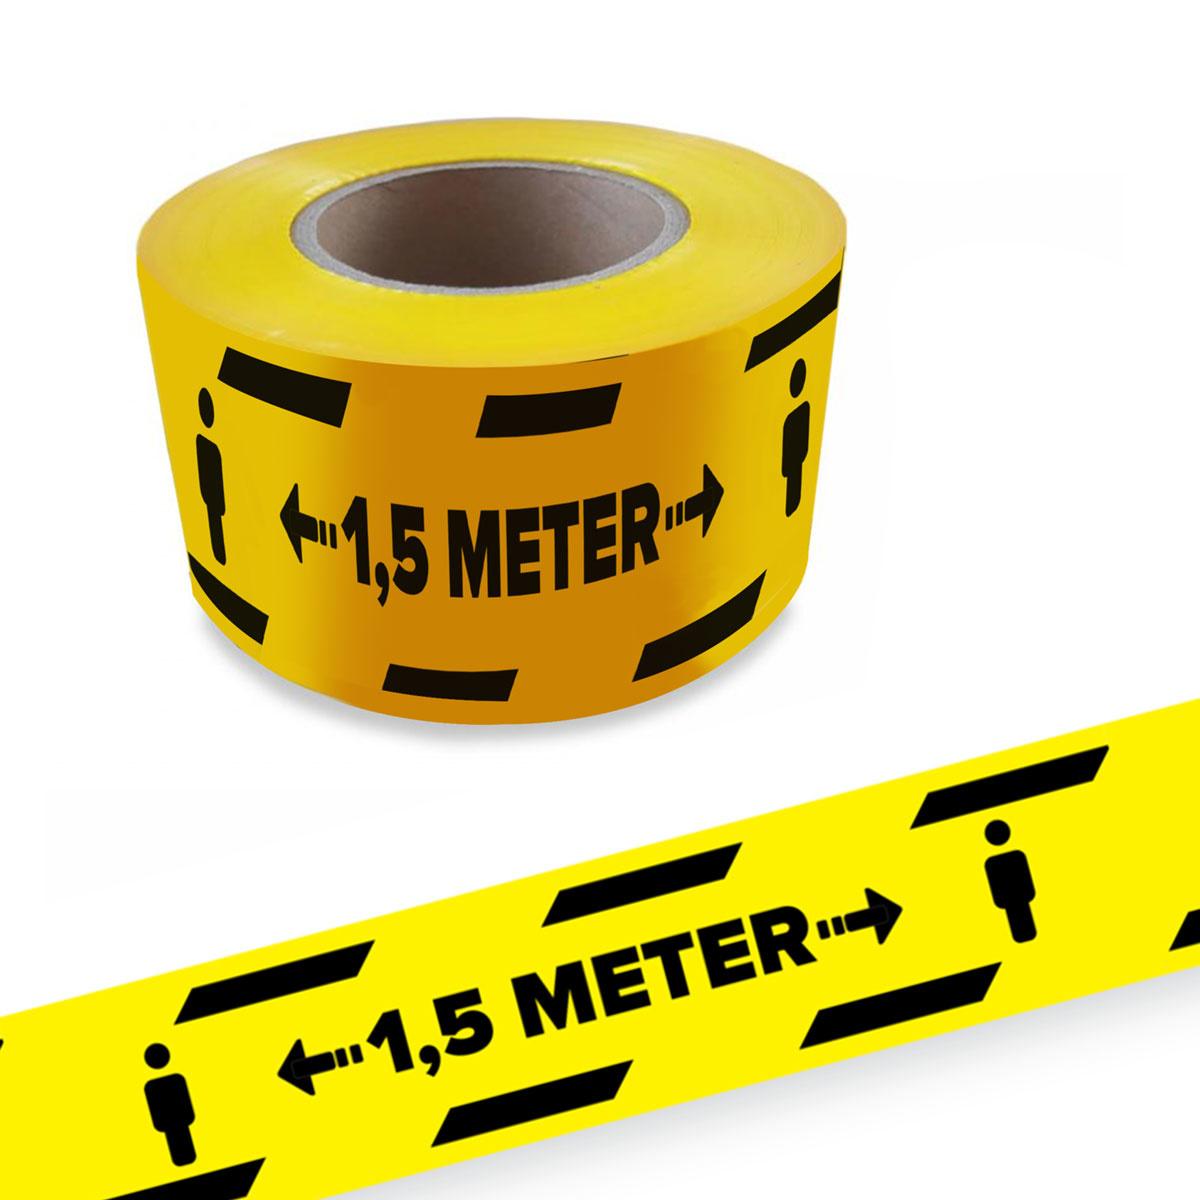 Keep 1,5 mtr distance barrière tape covid19 corona